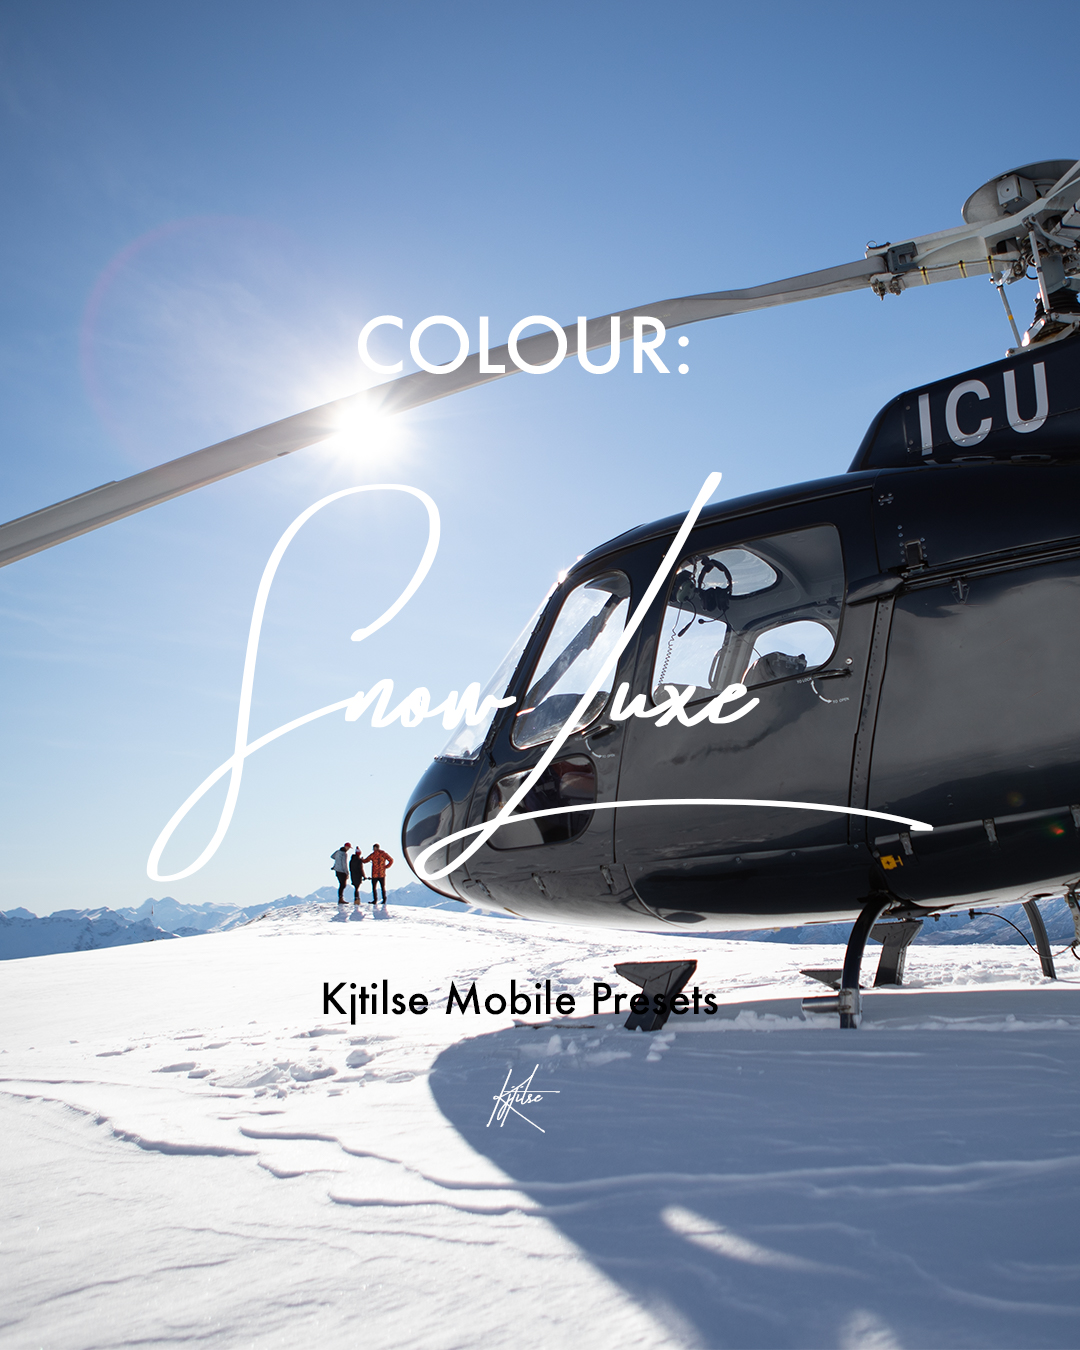 Snow Luxe.jpg